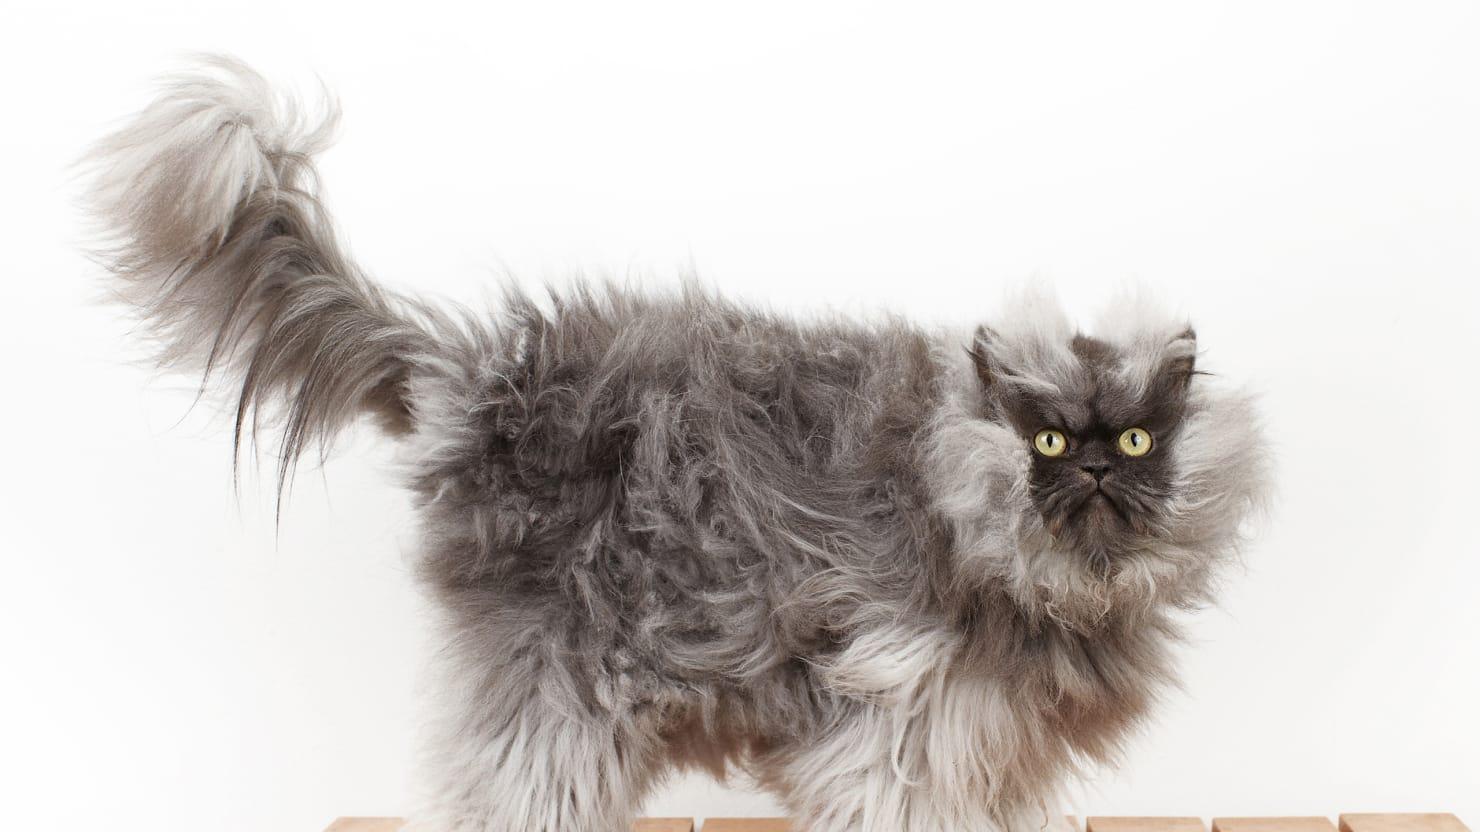 ryan - Smallest Cat In The World Guinness 2013